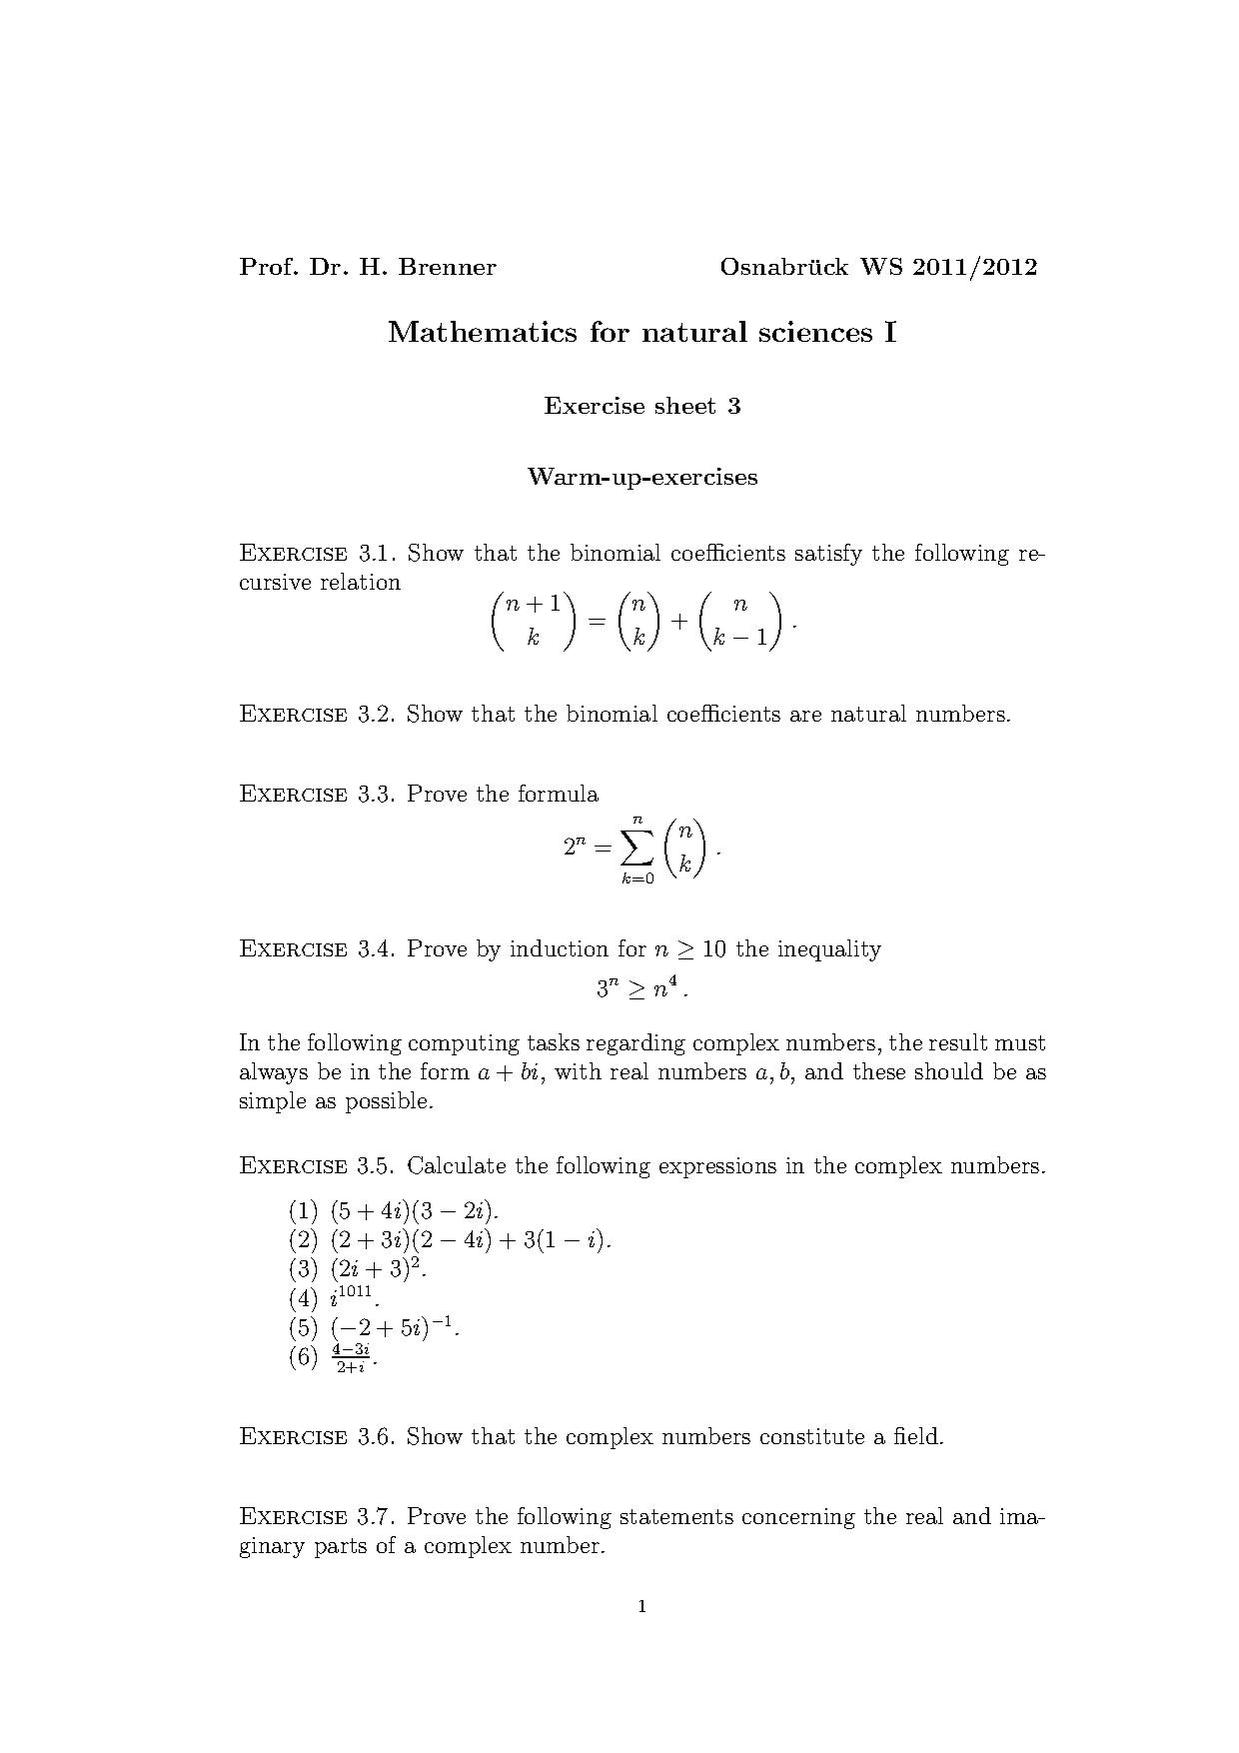 Modern Mathe Pdf Arbeitsblatt Inspiration - Mathe Arbeitsblatt ...